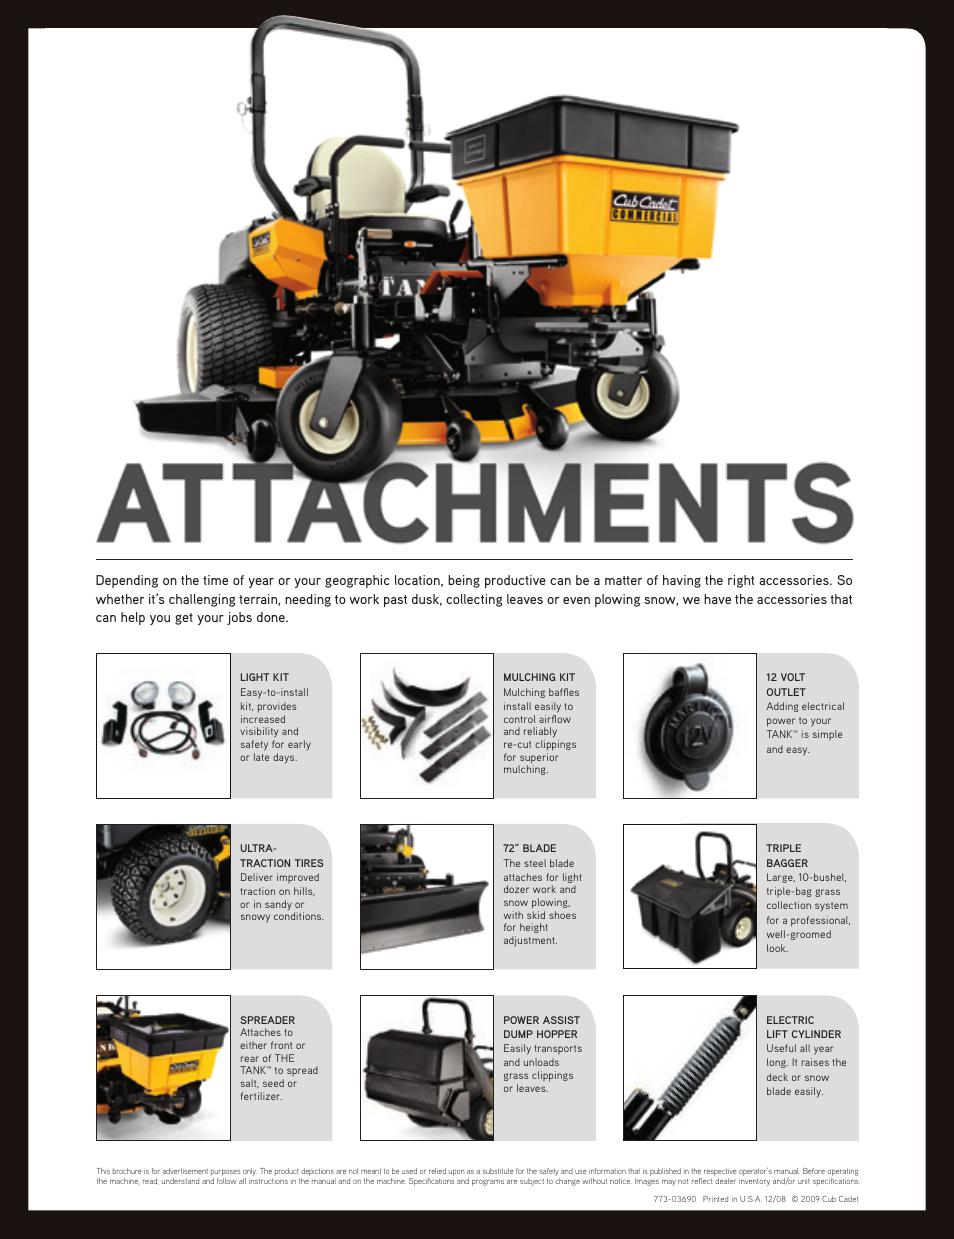 attachments cub cadet the tank m72 user manual page 4 4 rh manualsdir com Yard Man Lawn Mower Manuals Lawn Mower Repair Manual